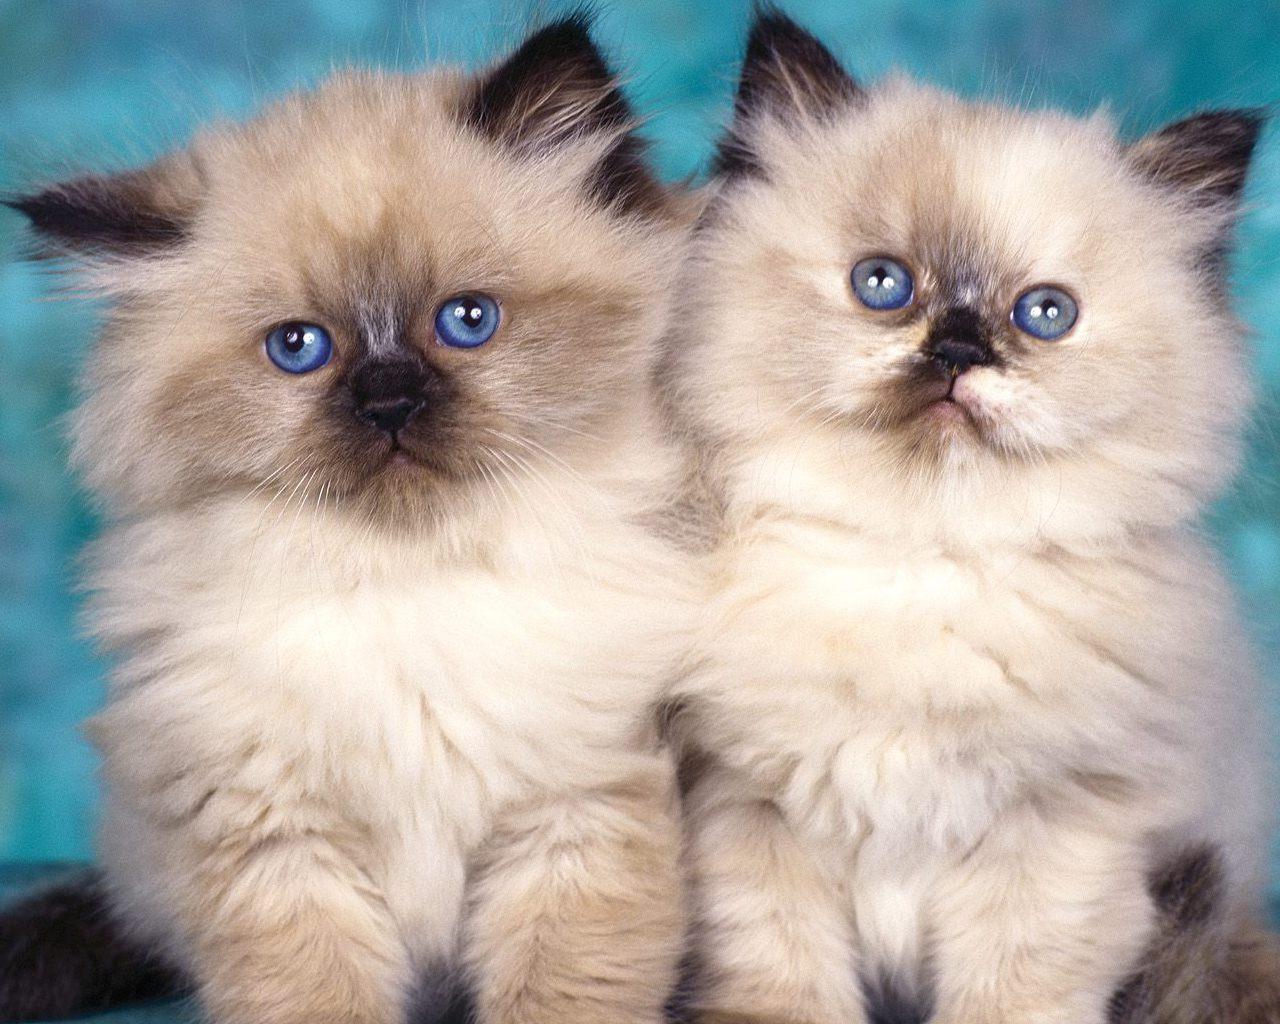 himalayan kittens Wallpaper 1280x1024